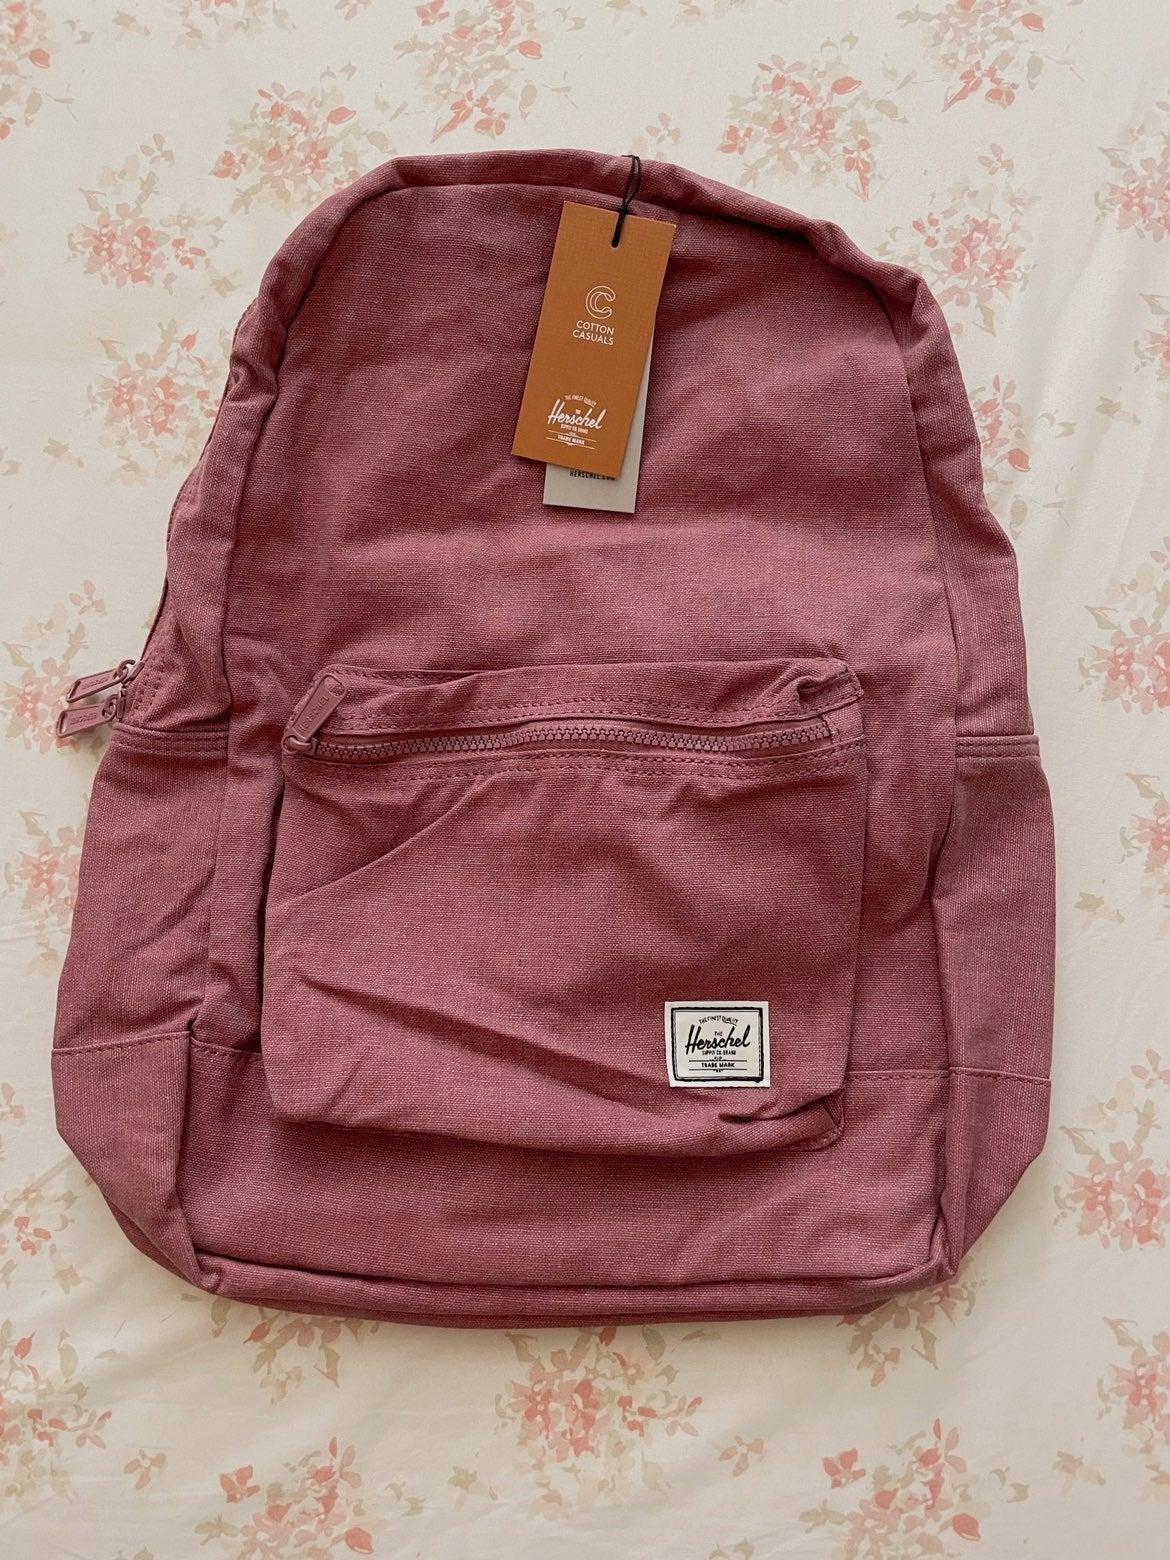 Hershel Backpack *Cotton Casuals